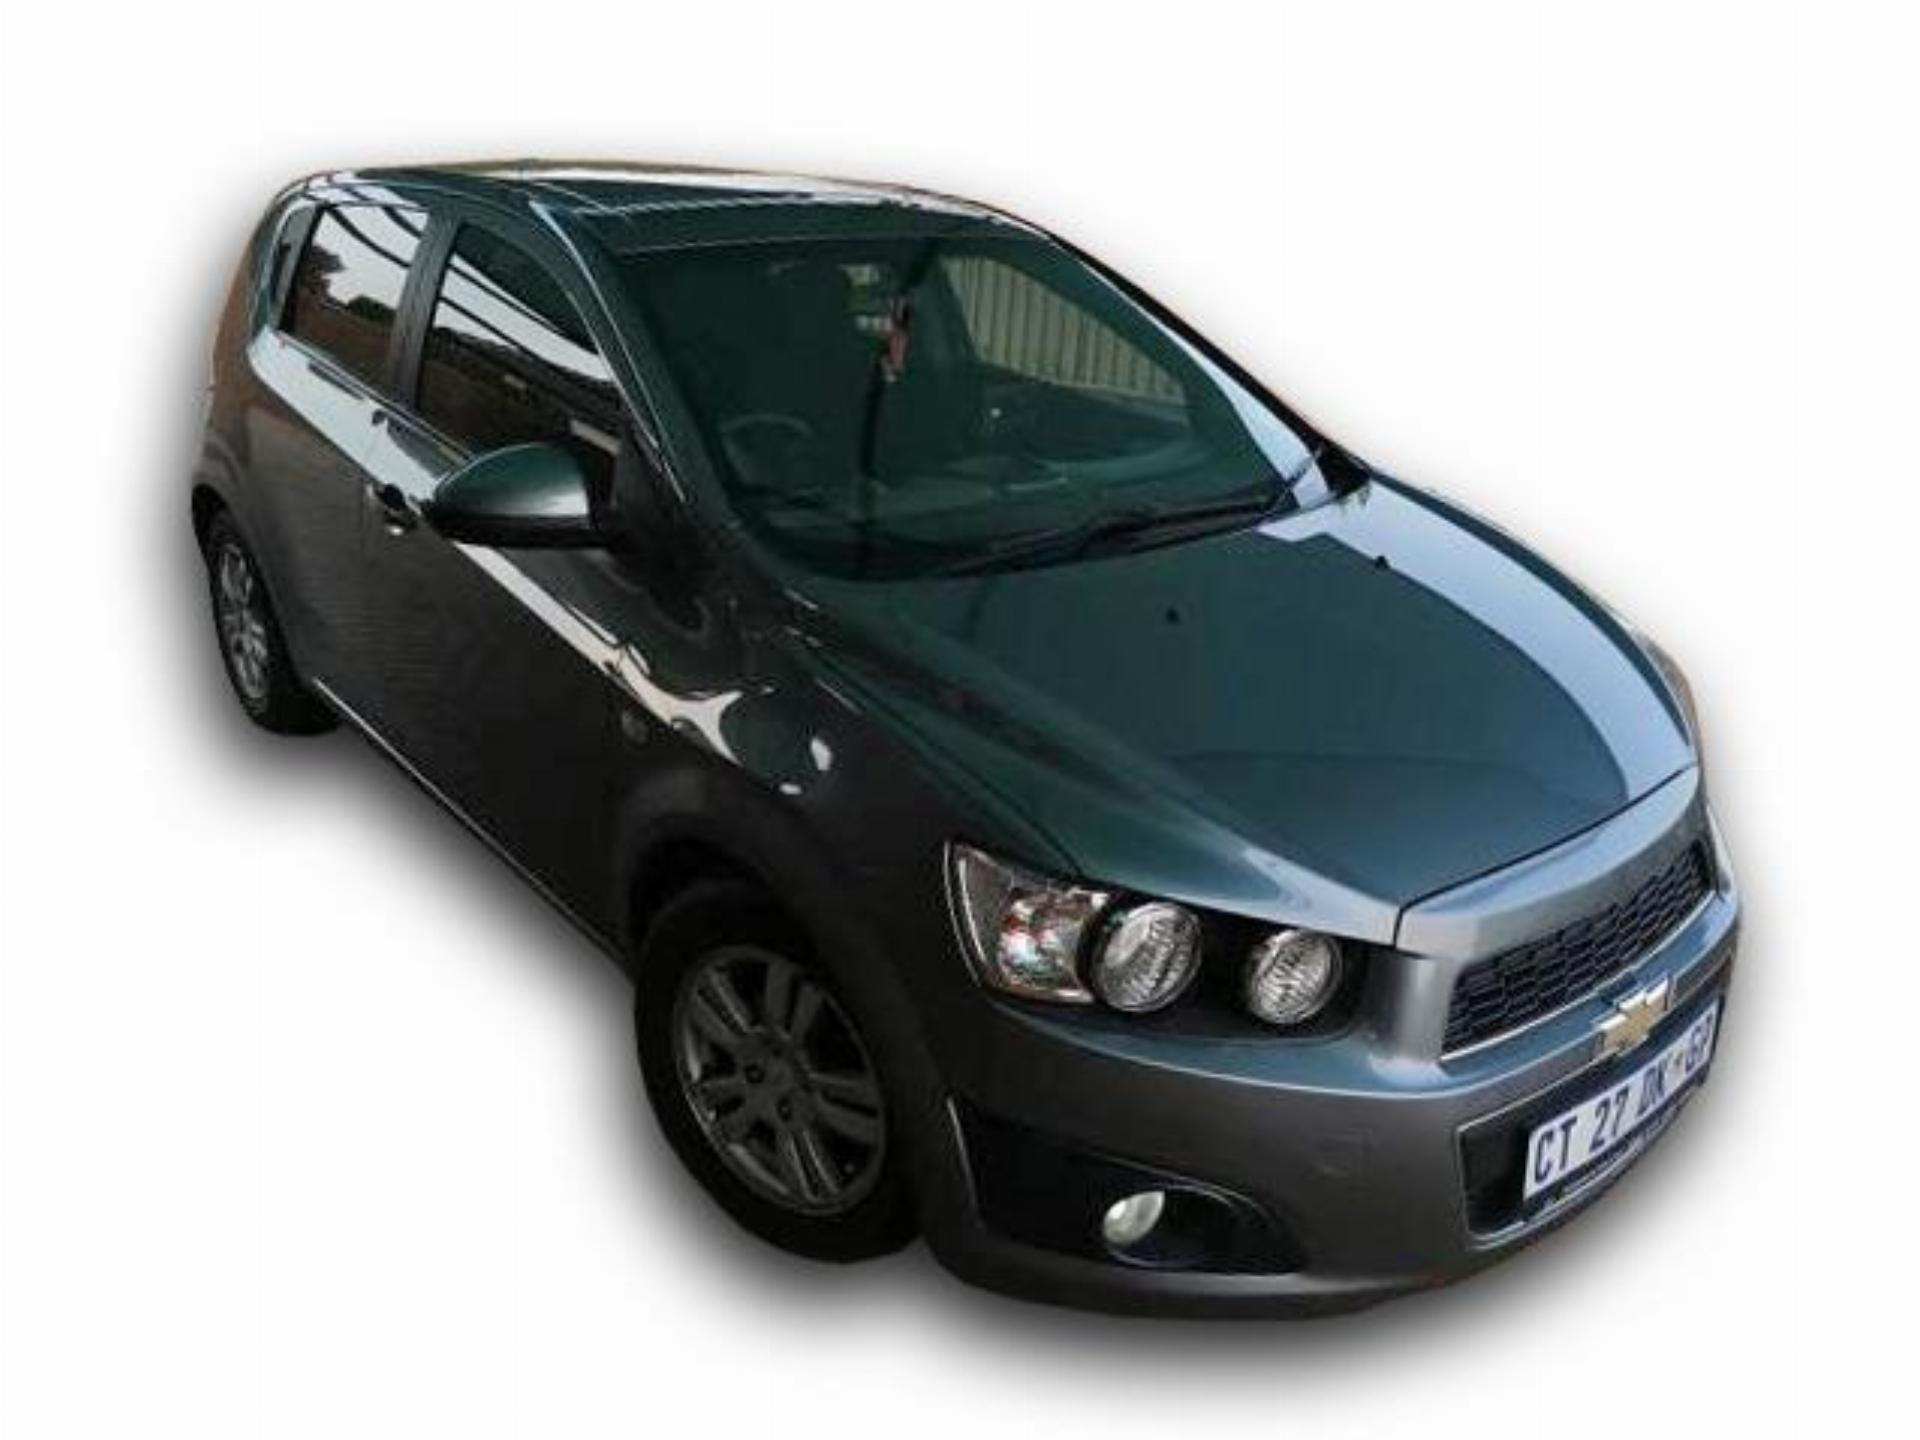 Chevrolet Sonic 1.4 LS 5DR